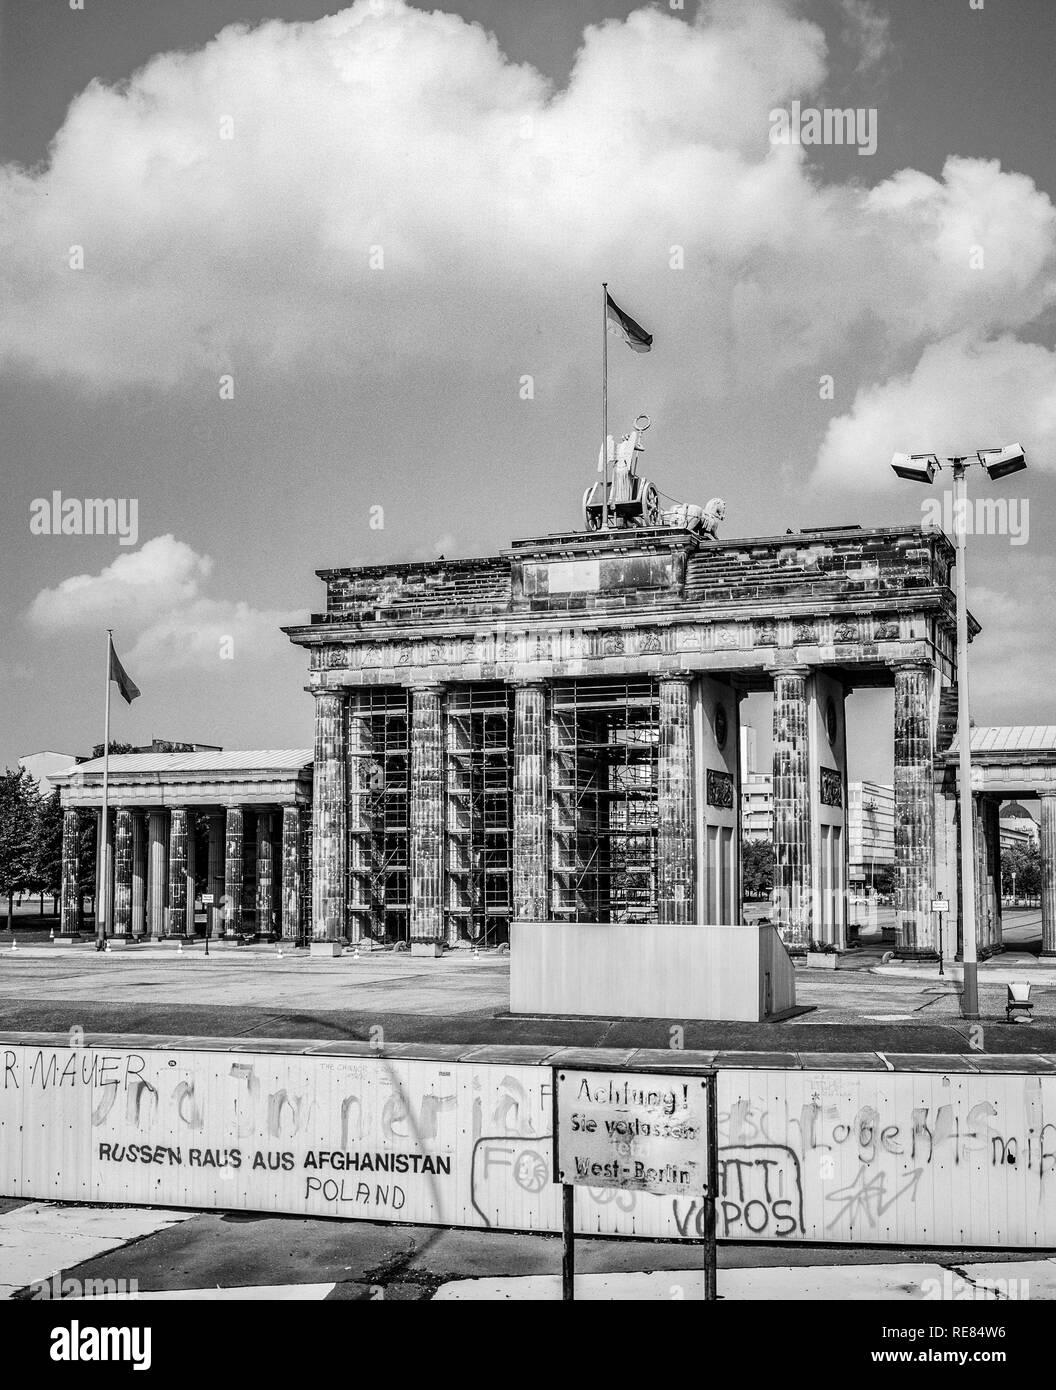 August 1986, Berlin Wall and Brandenburg Gate in East Berlin, West Berlin side, Germany, Europe, - Stock Image